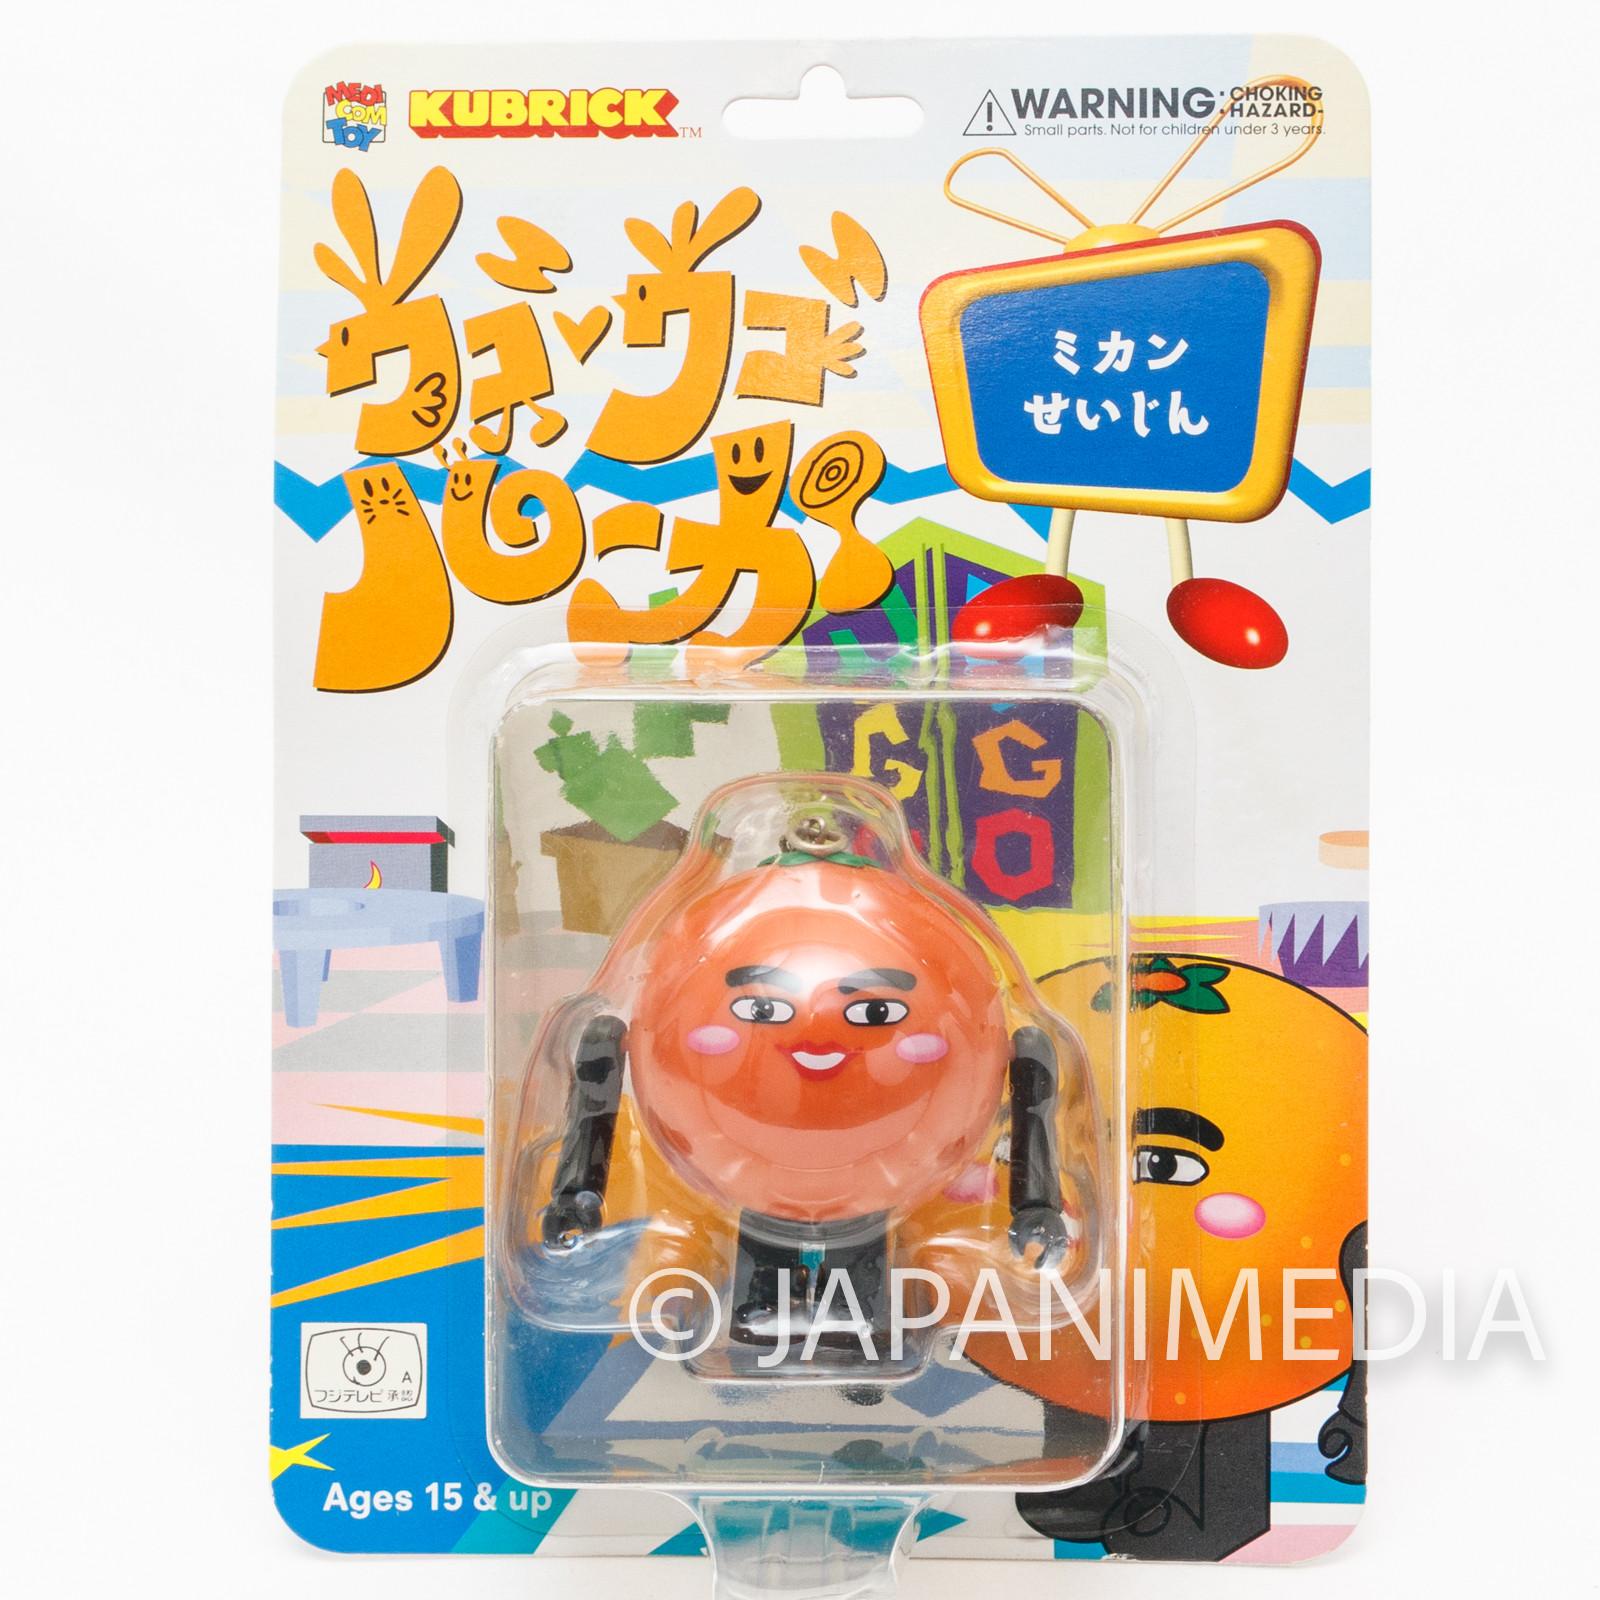 Kubrick UgoUgo Luga Mikan Seijin Figure Medicom Toy Fuji TV JAPAN ANIME